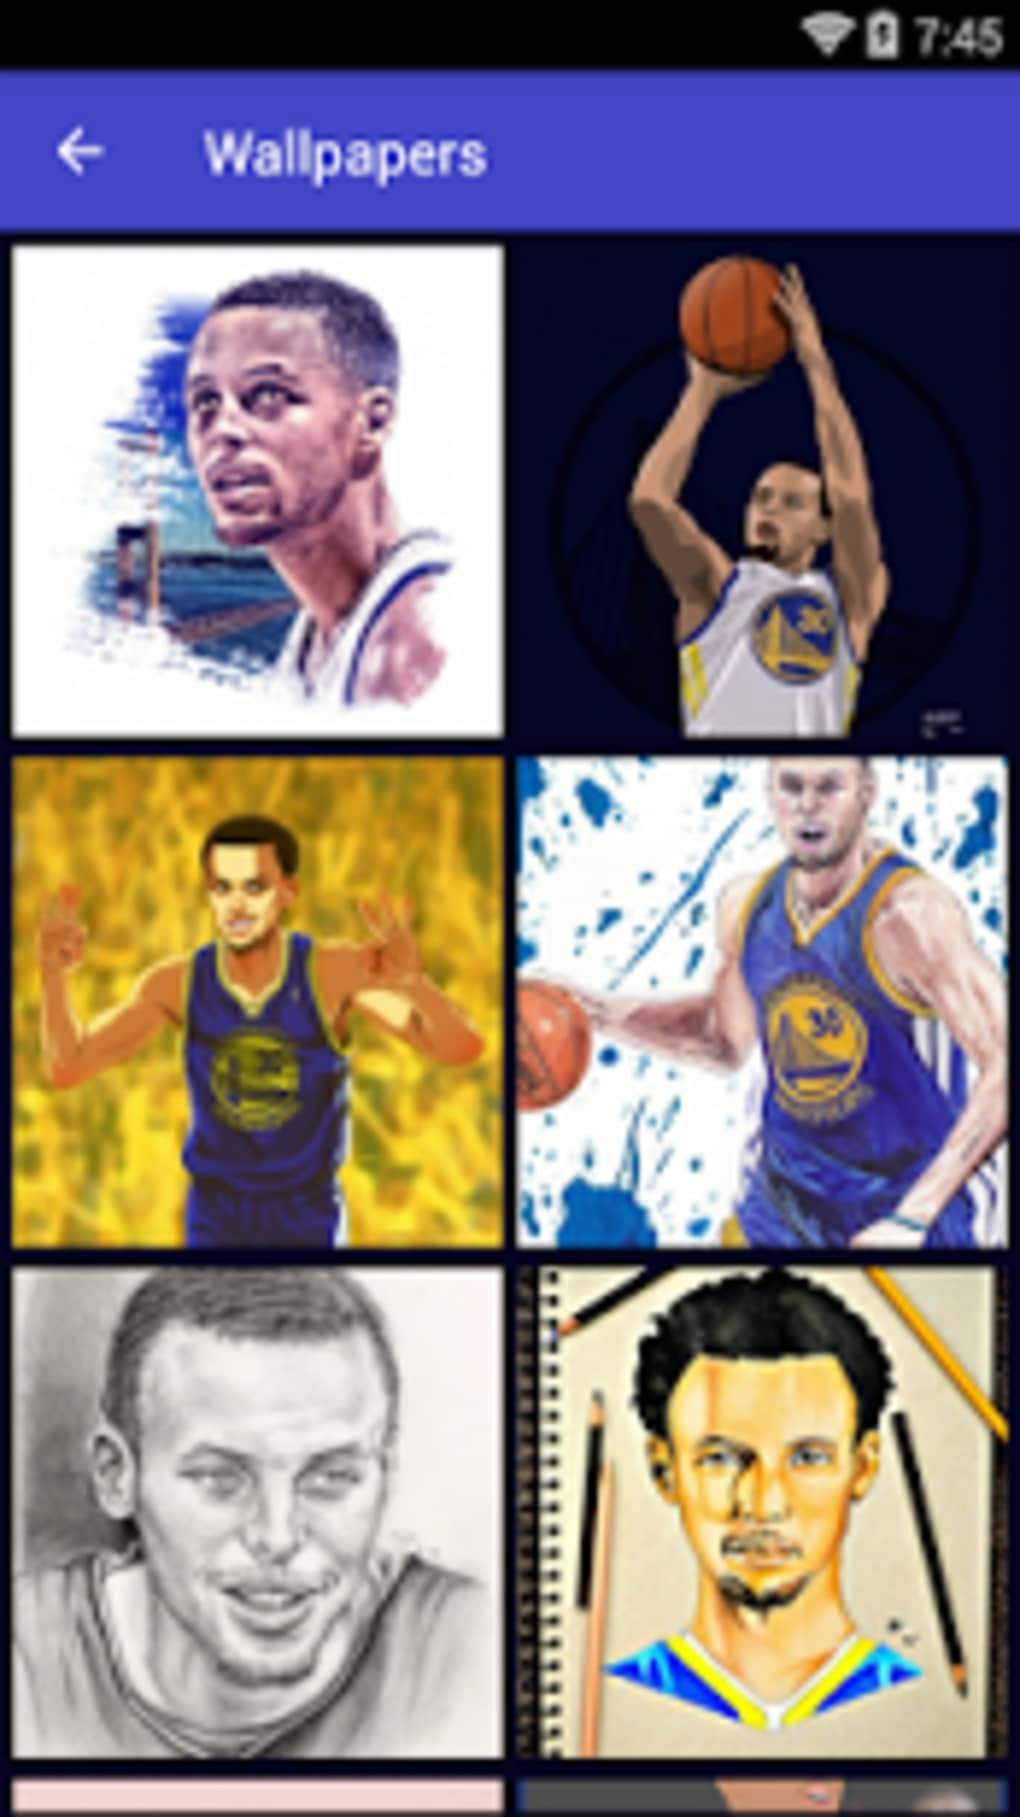 HD Stephen Curry Wallpaper